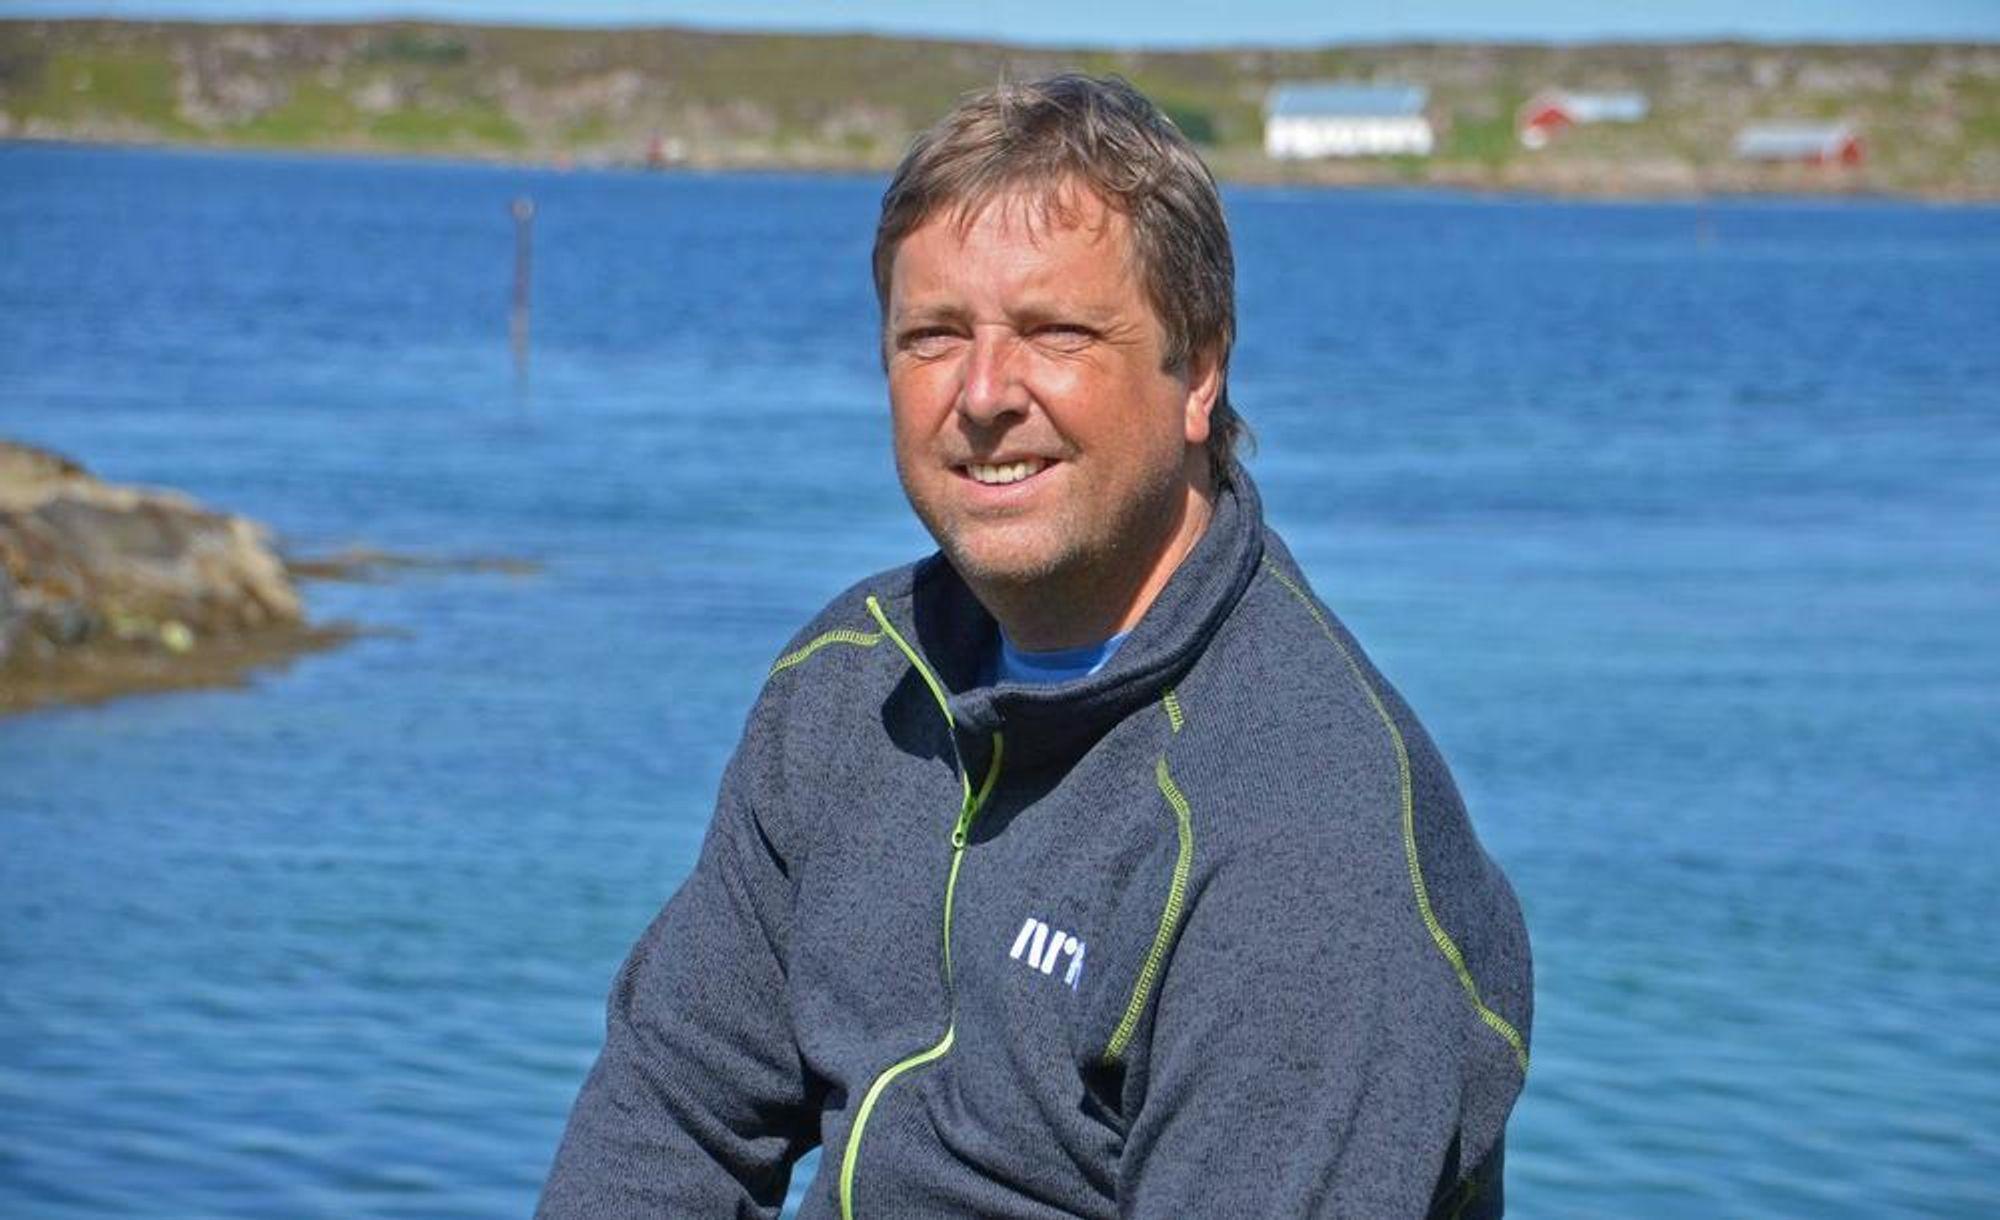 Redaktør Tore Strømøy ute på øya Frøya, der han også driver nettavisen Frøya.no.